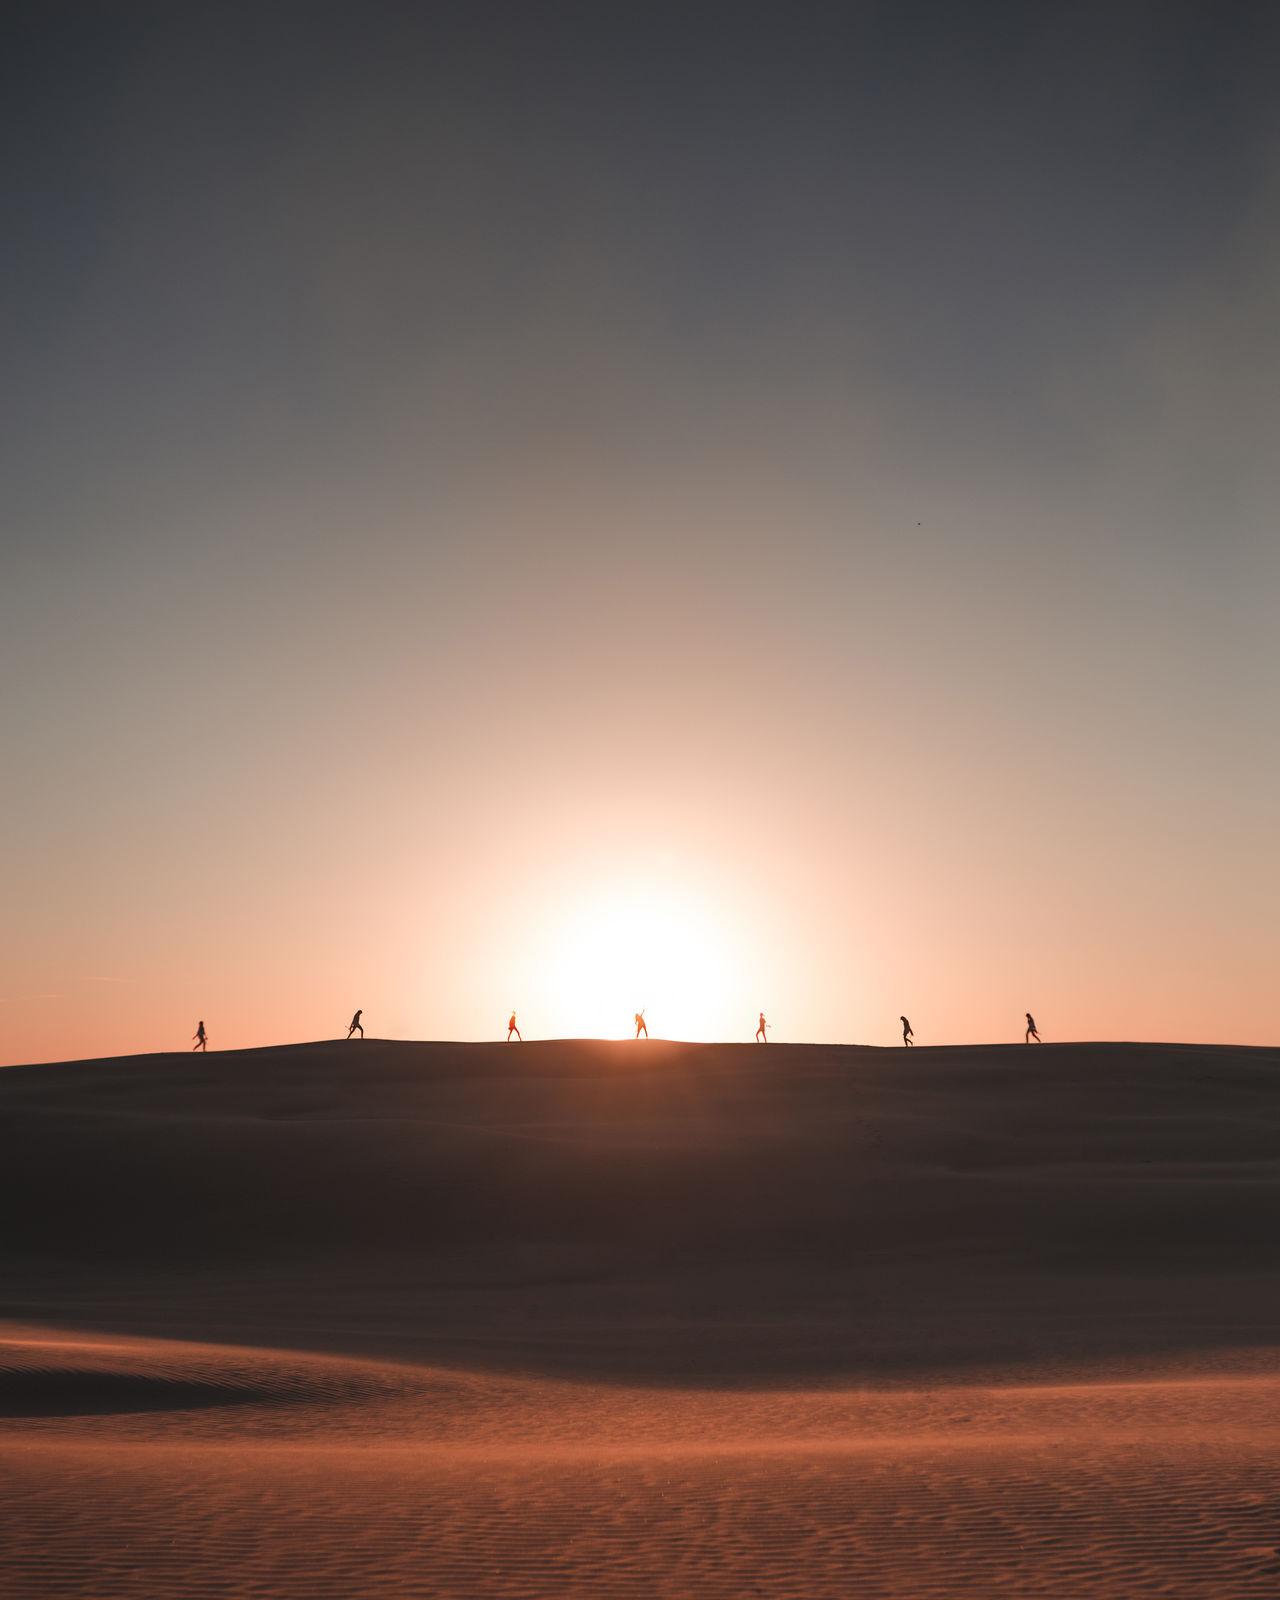 Adventure Desert Desert Journey Landscape Nature No People Outdoors Sand Sand Dune Silhouette Sillouette Sky Sun Sunset Travel Fresh On Market 2016